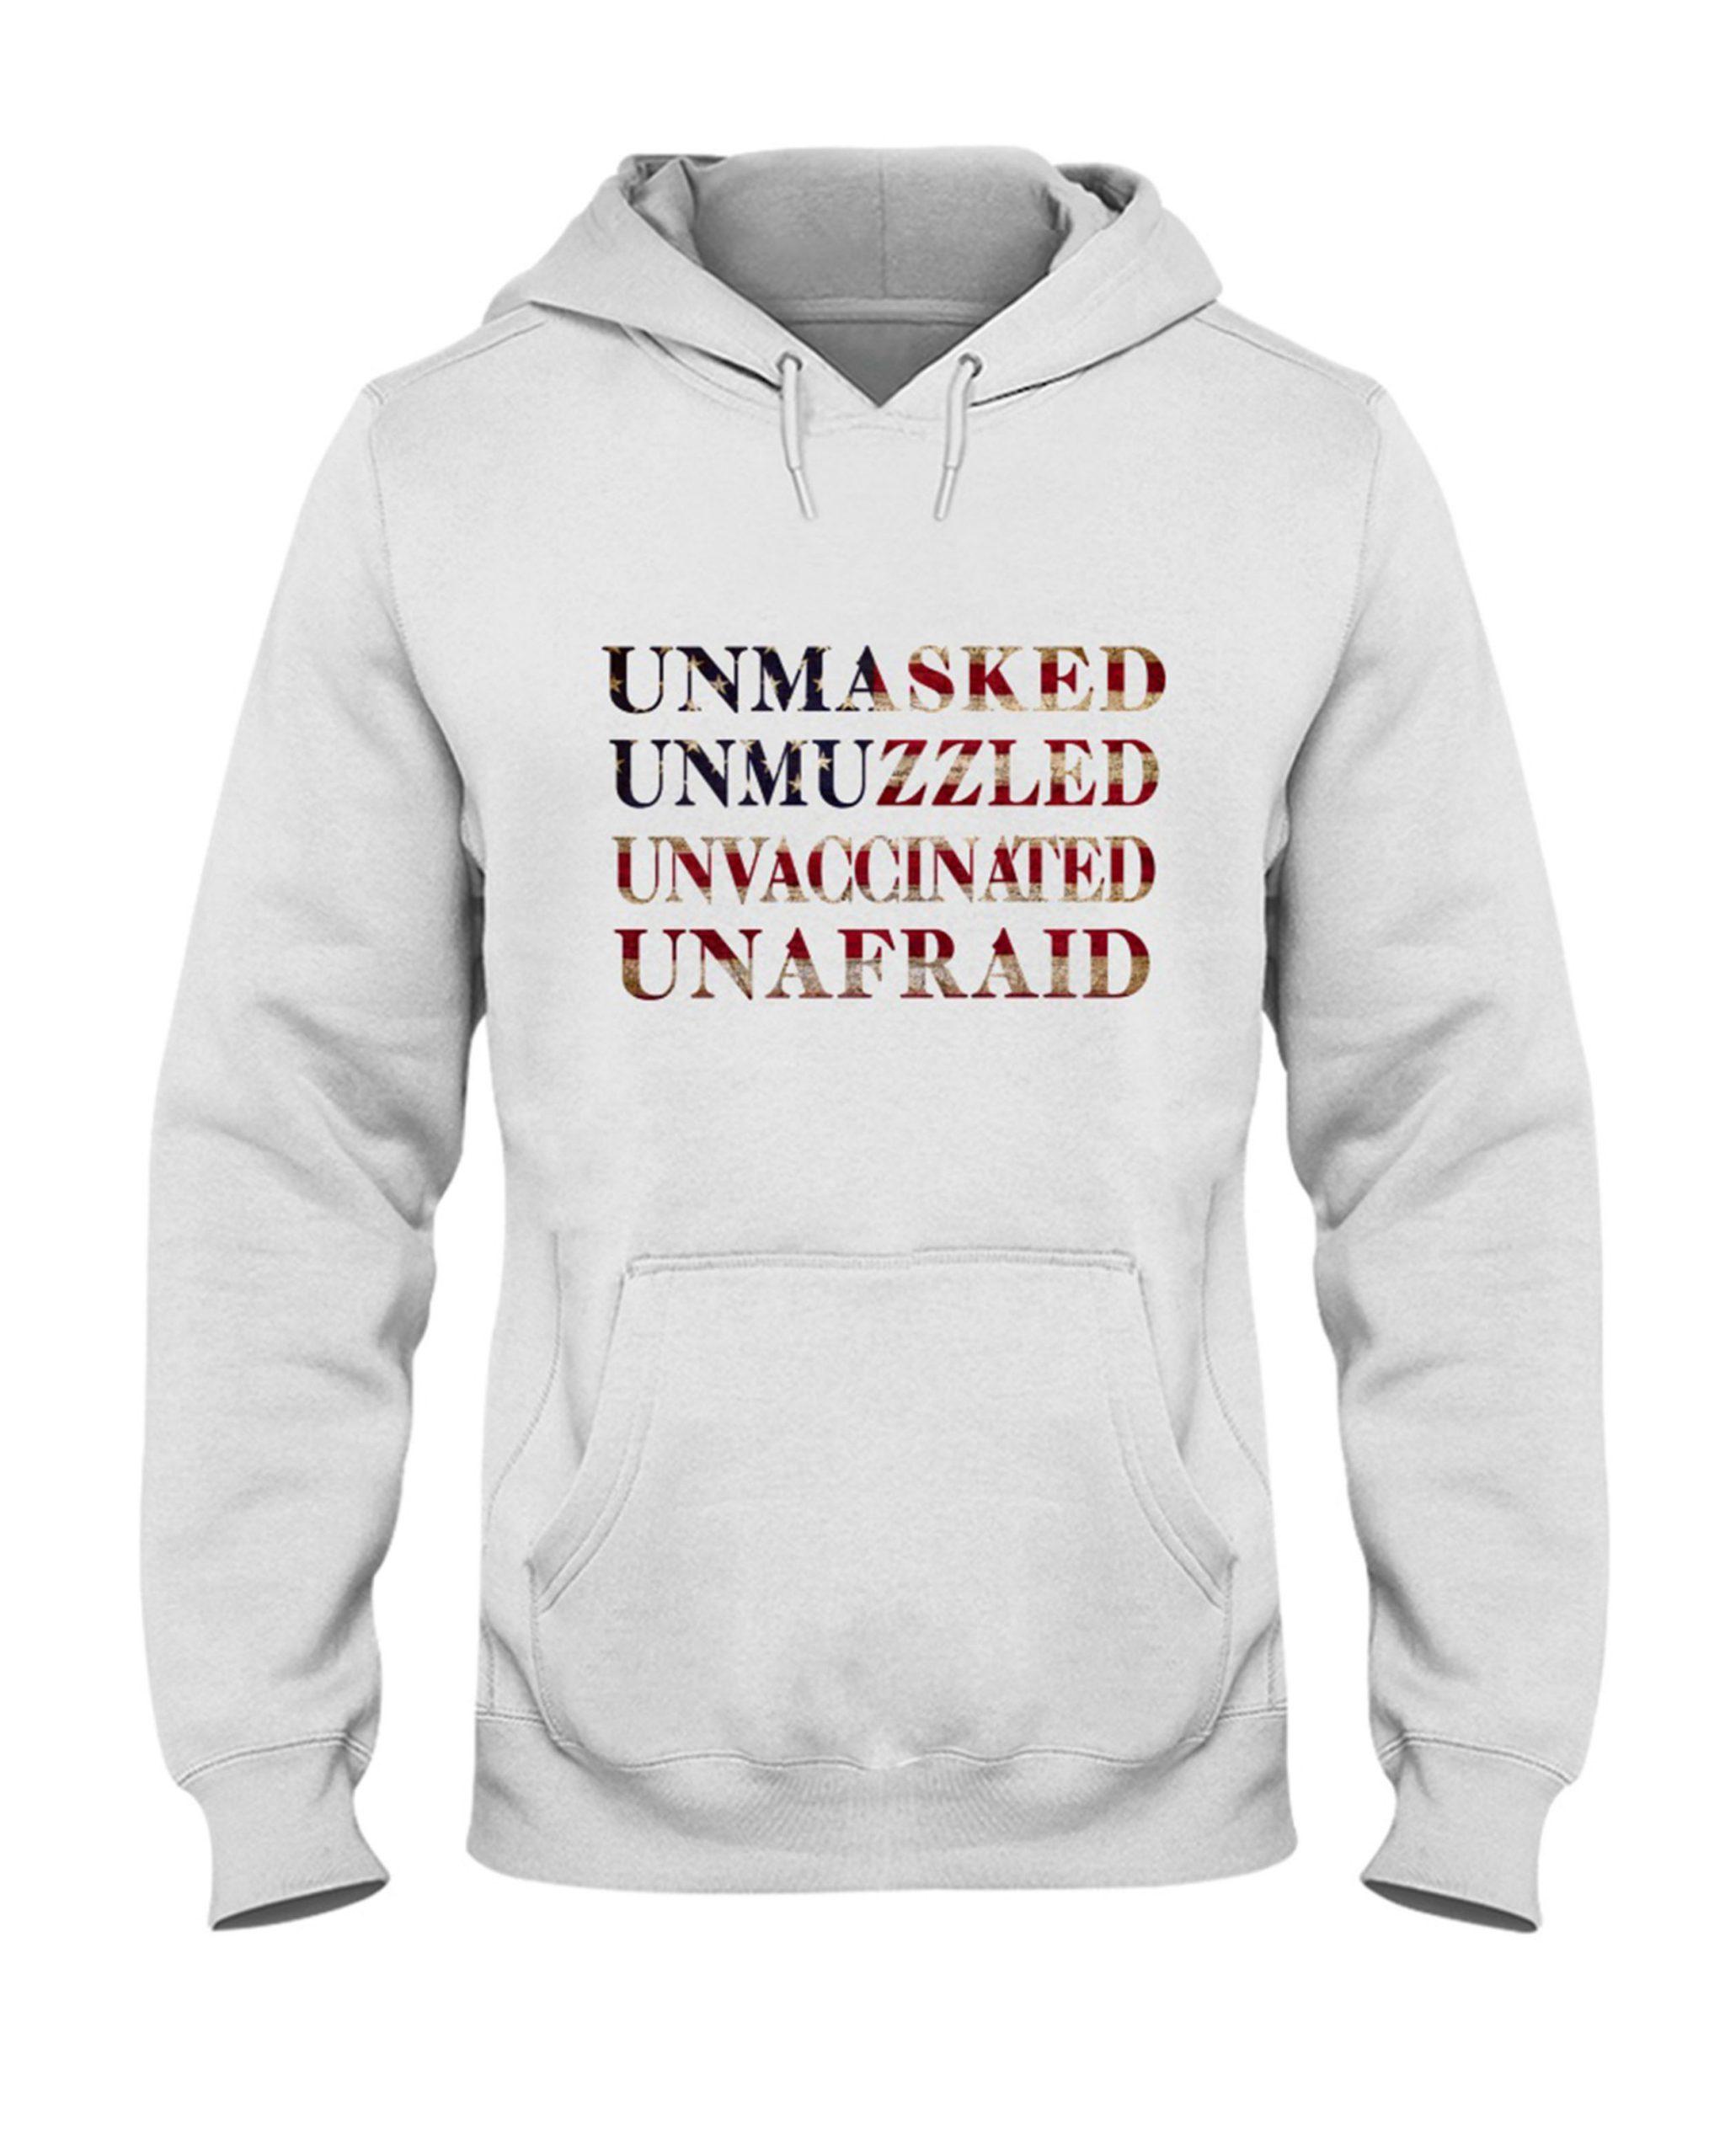 Unmasked Unmuzzled Unvaccinated Unafraid Shirt 1